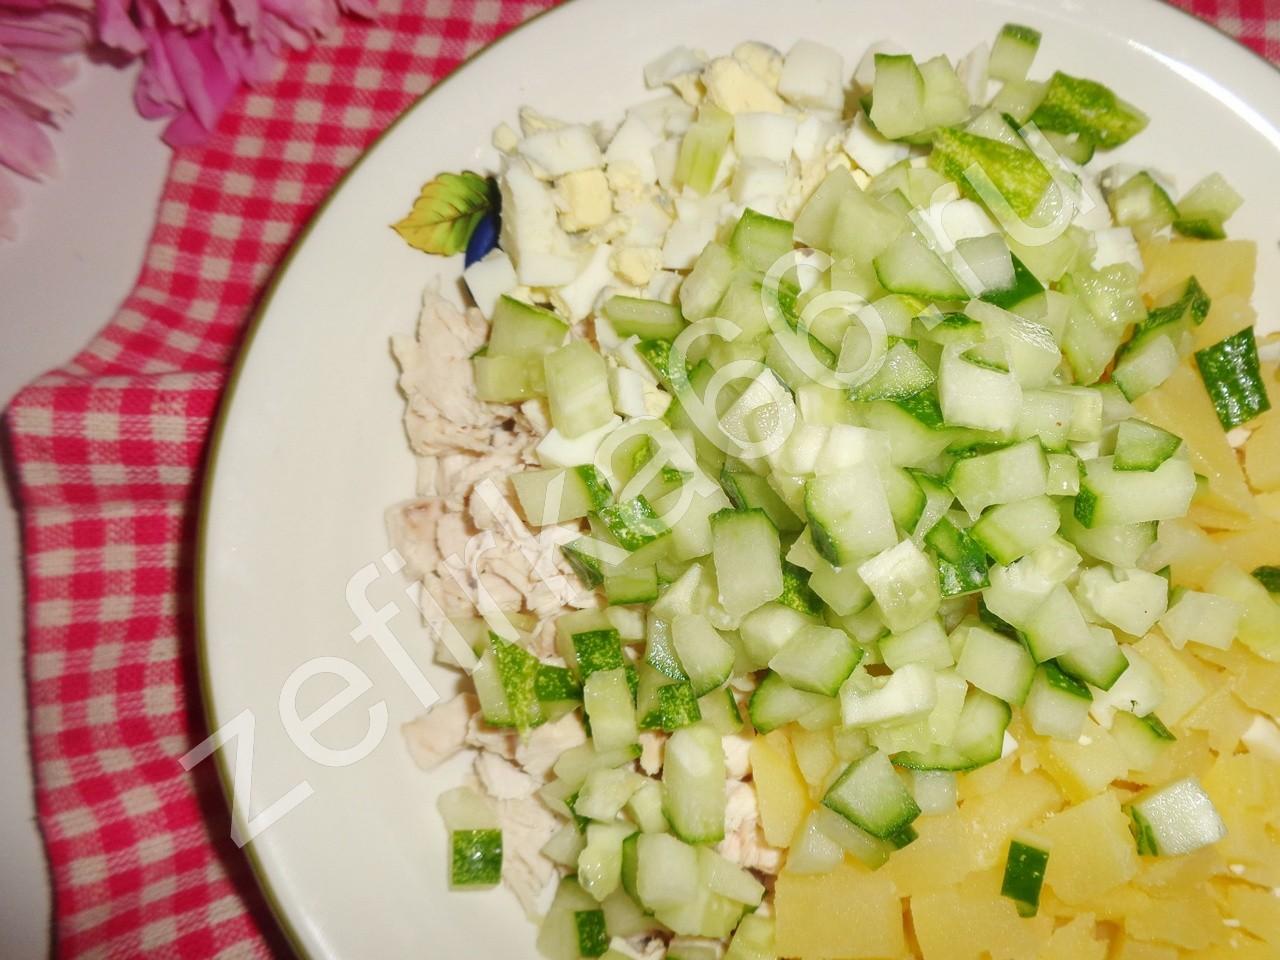 Рецепт оливье пошагово с фото